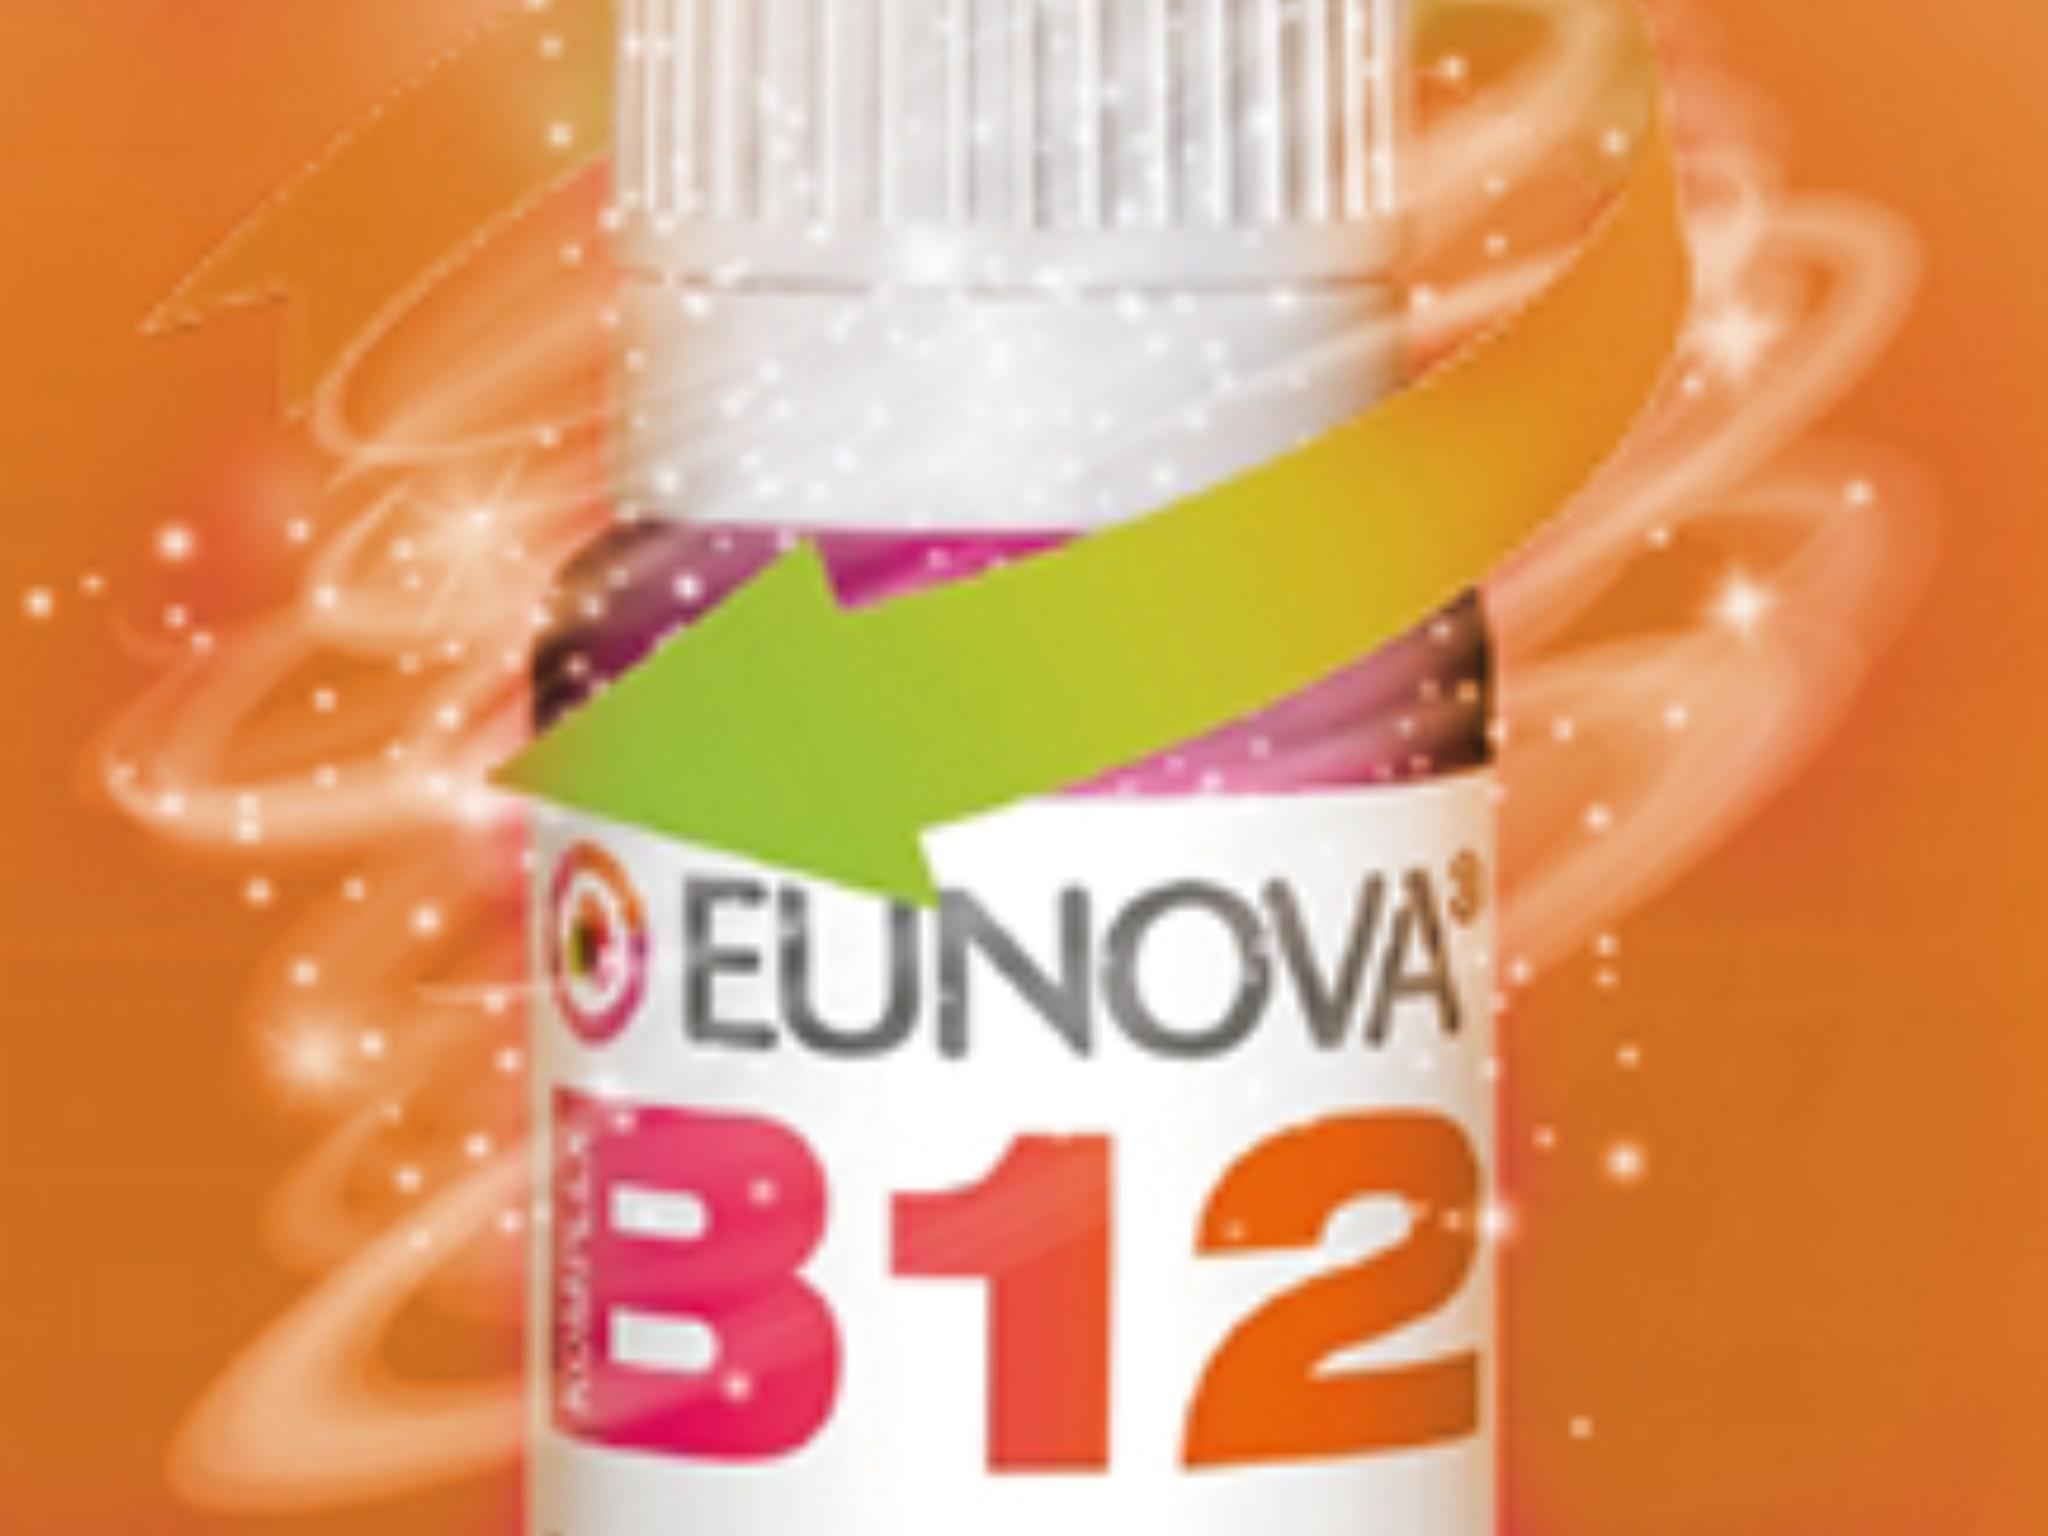 (Eunova) Nahrungsergänzungsmittel mit Vitaminen und Aminosäuren - Probe